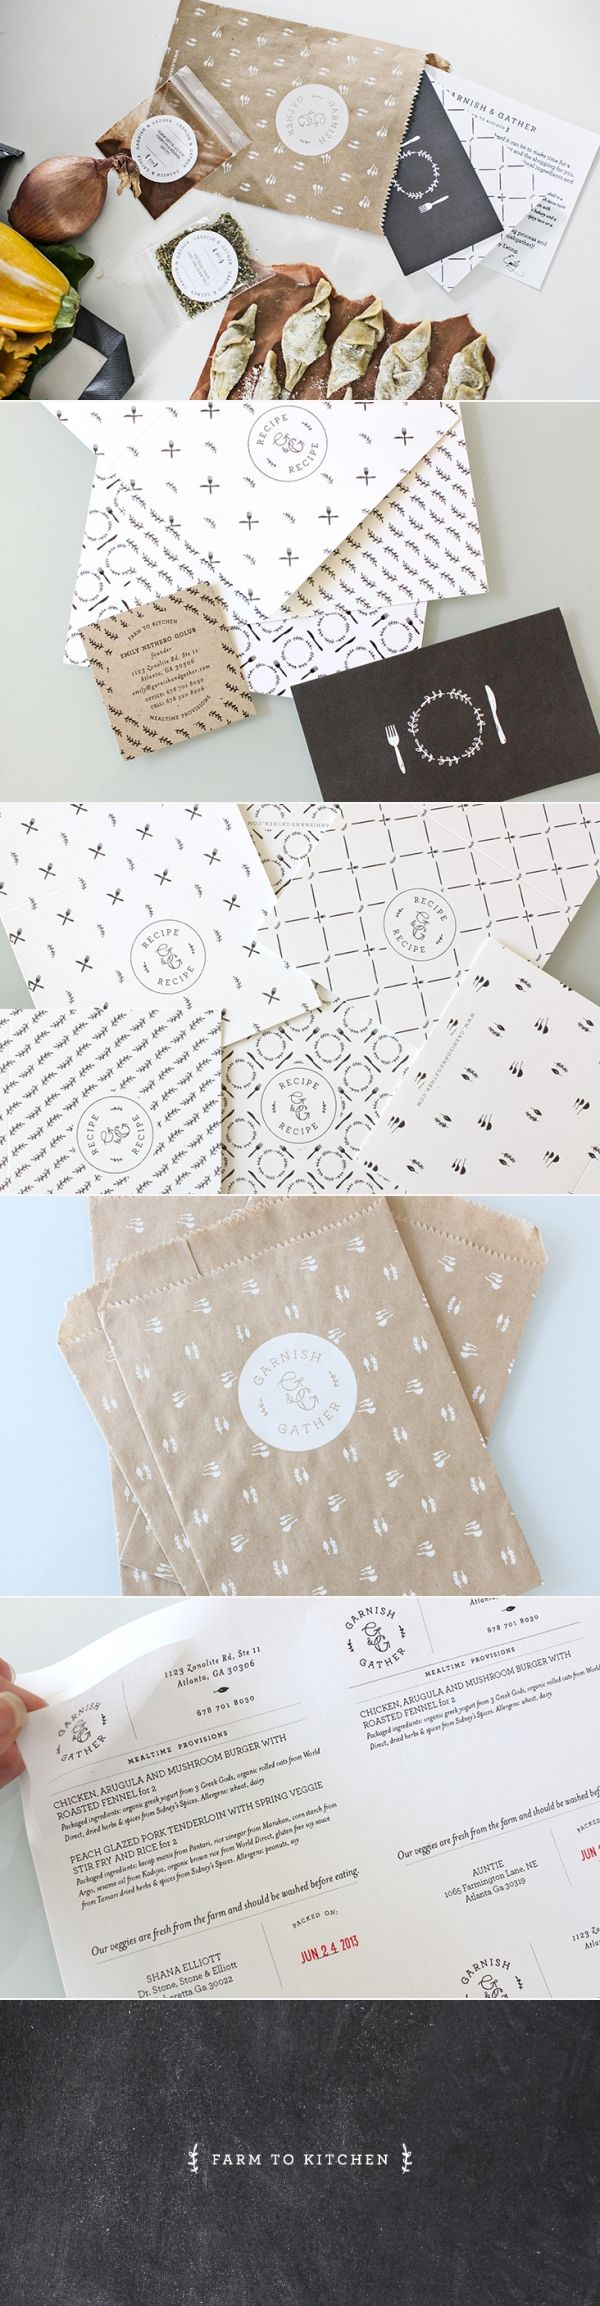 * Garnish & Gather / by Stitch Design Co.